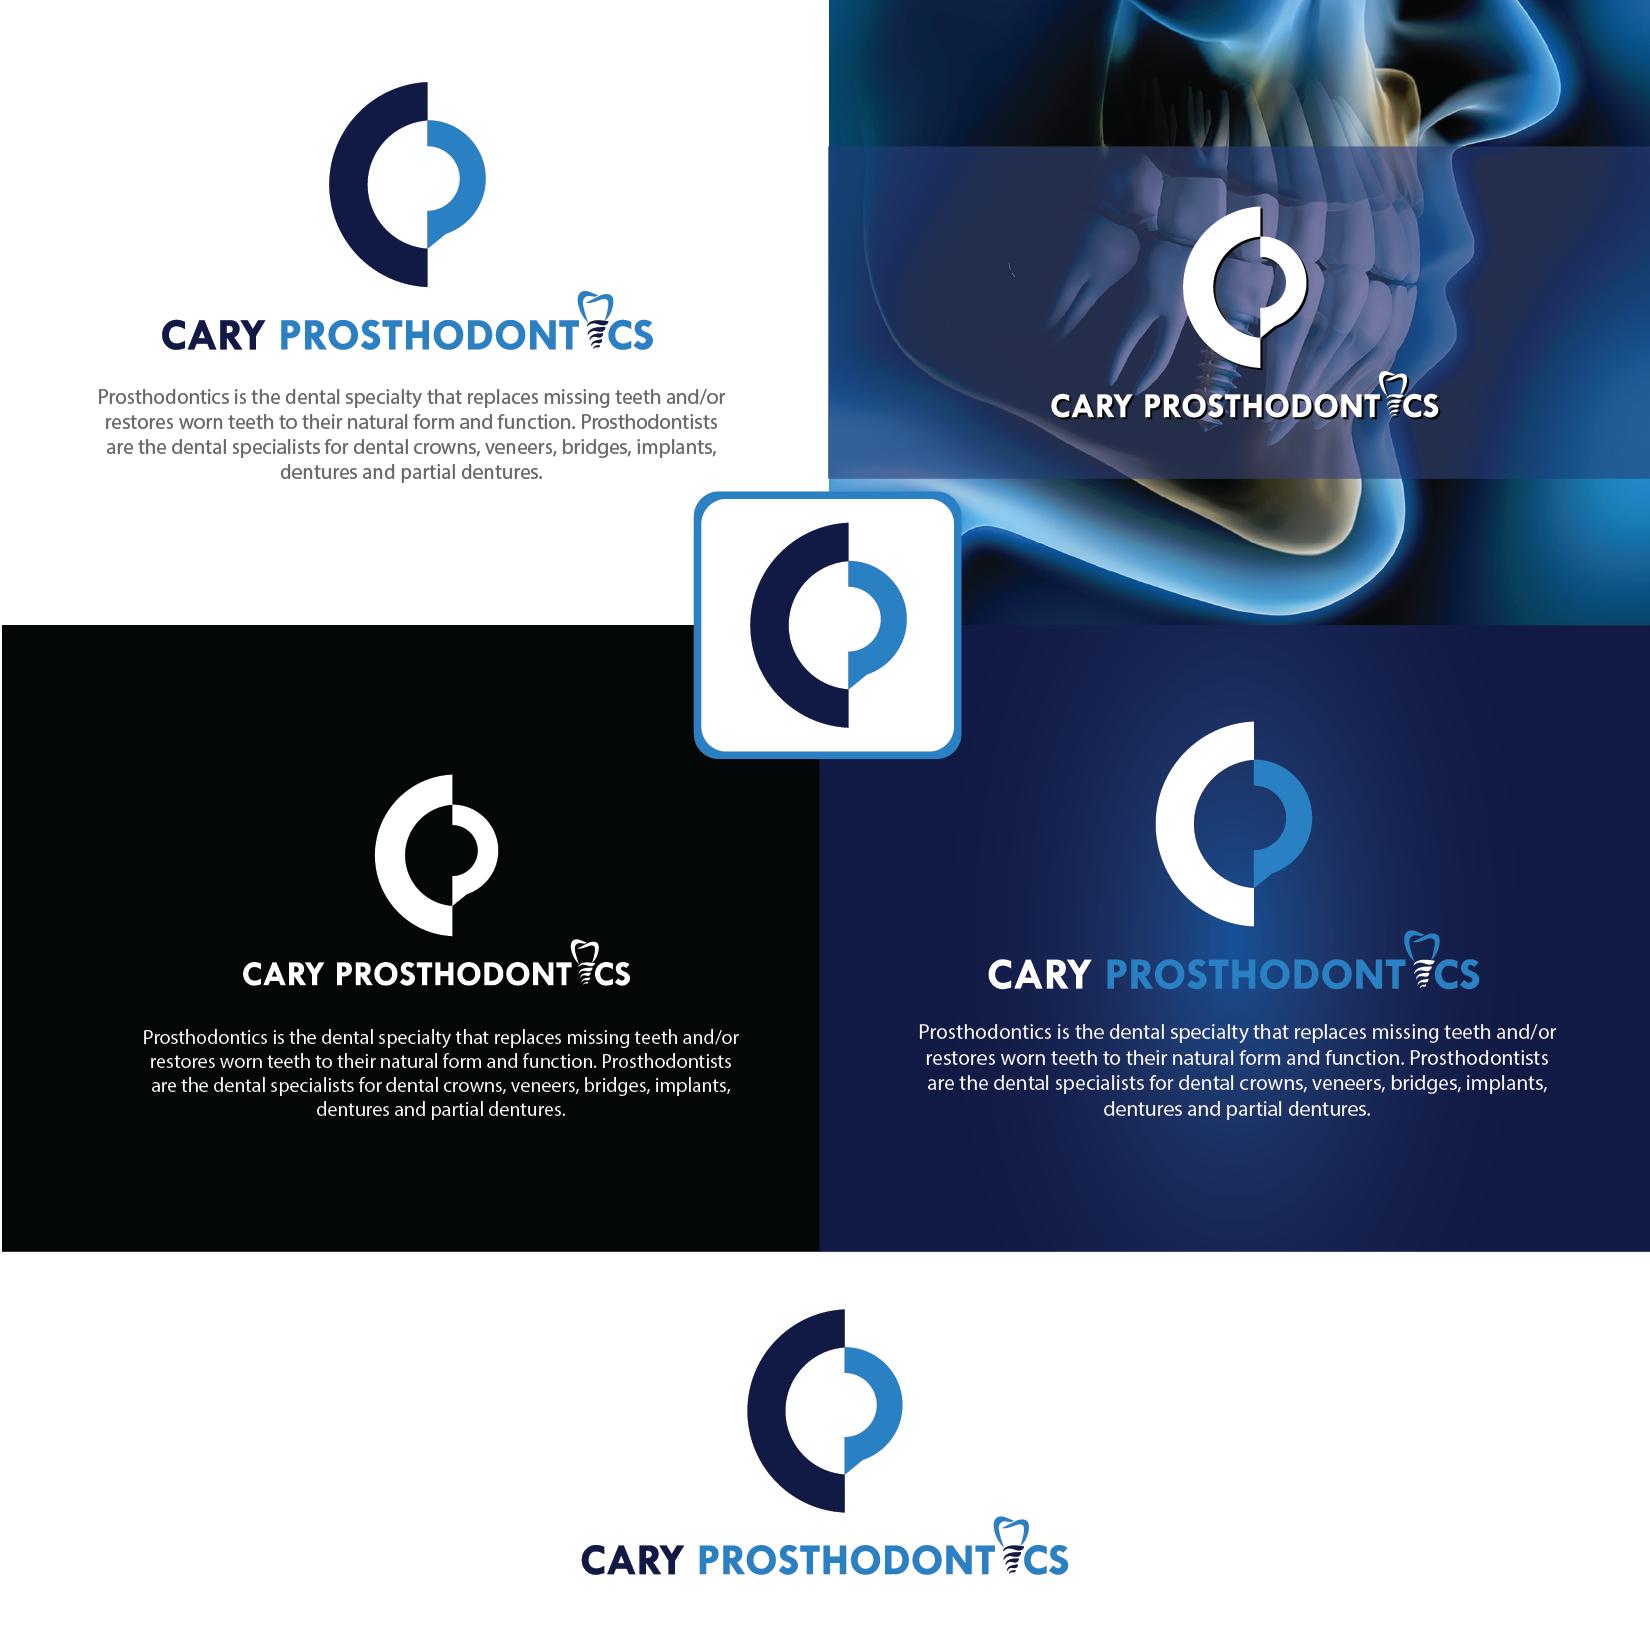 Logo Design by Private User - Entry No. 208 in the Logo Design Contest Cary Prosthodontics Logo Design.